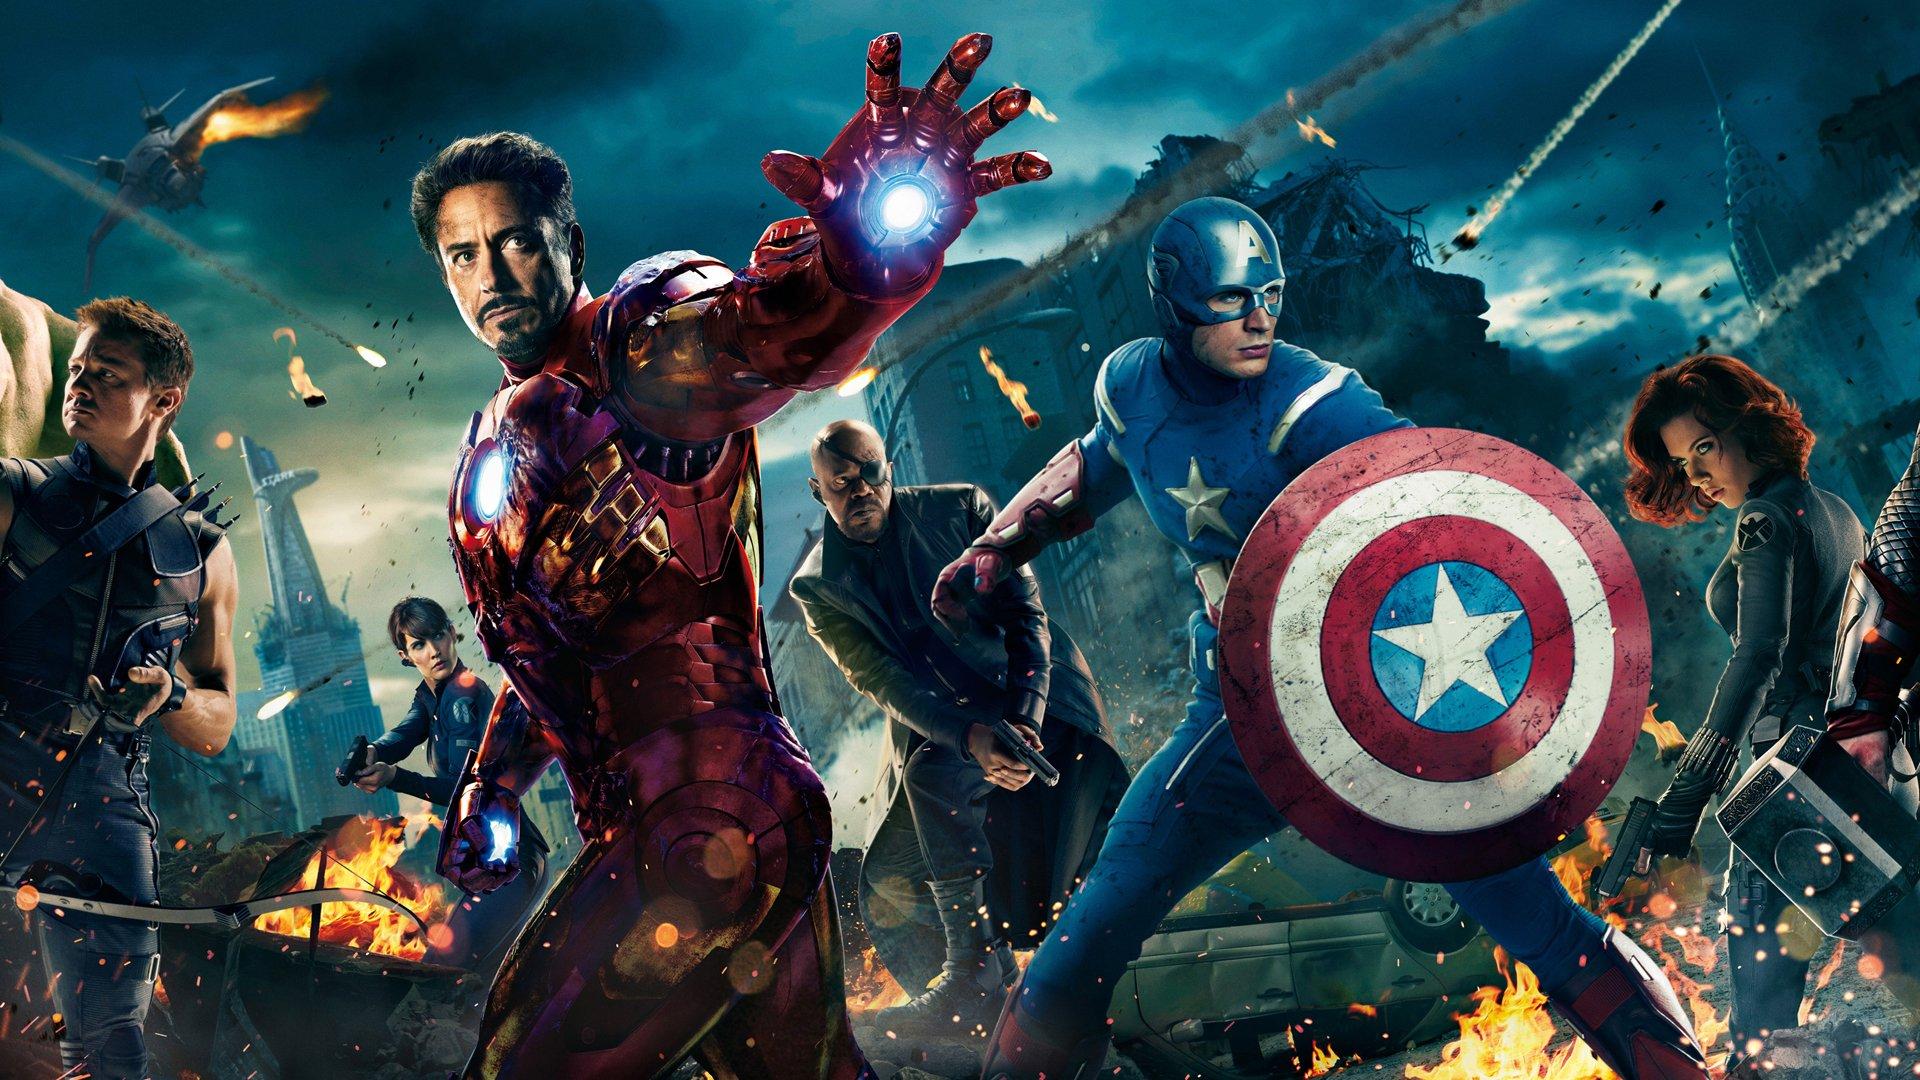 [42+] Avengers HD Wallpapers 1080p On WallpaperSafari